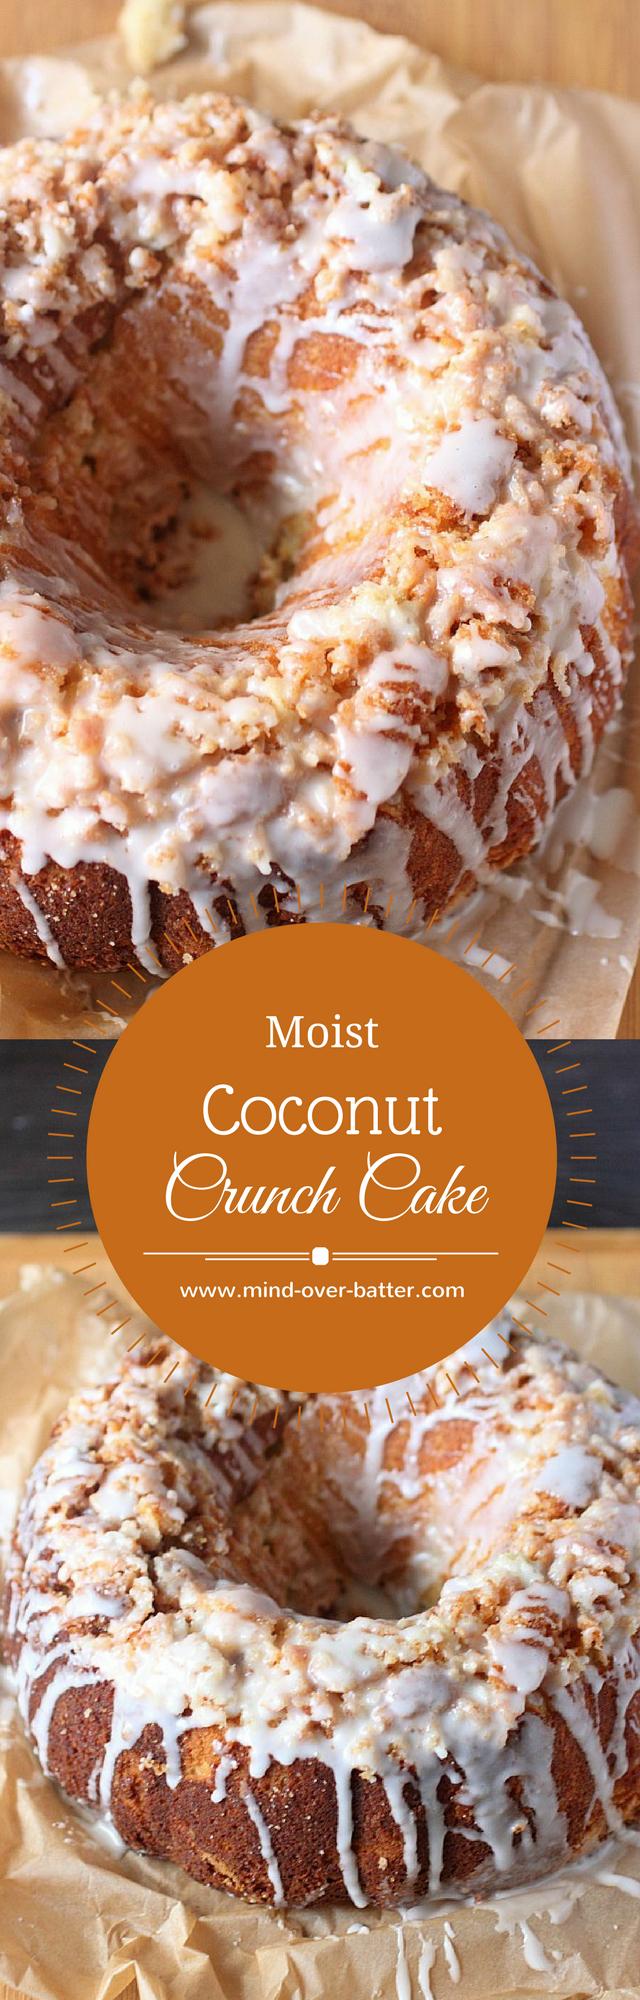 Moist Coconut Crunch Cake wwwmind over battercom Dessert